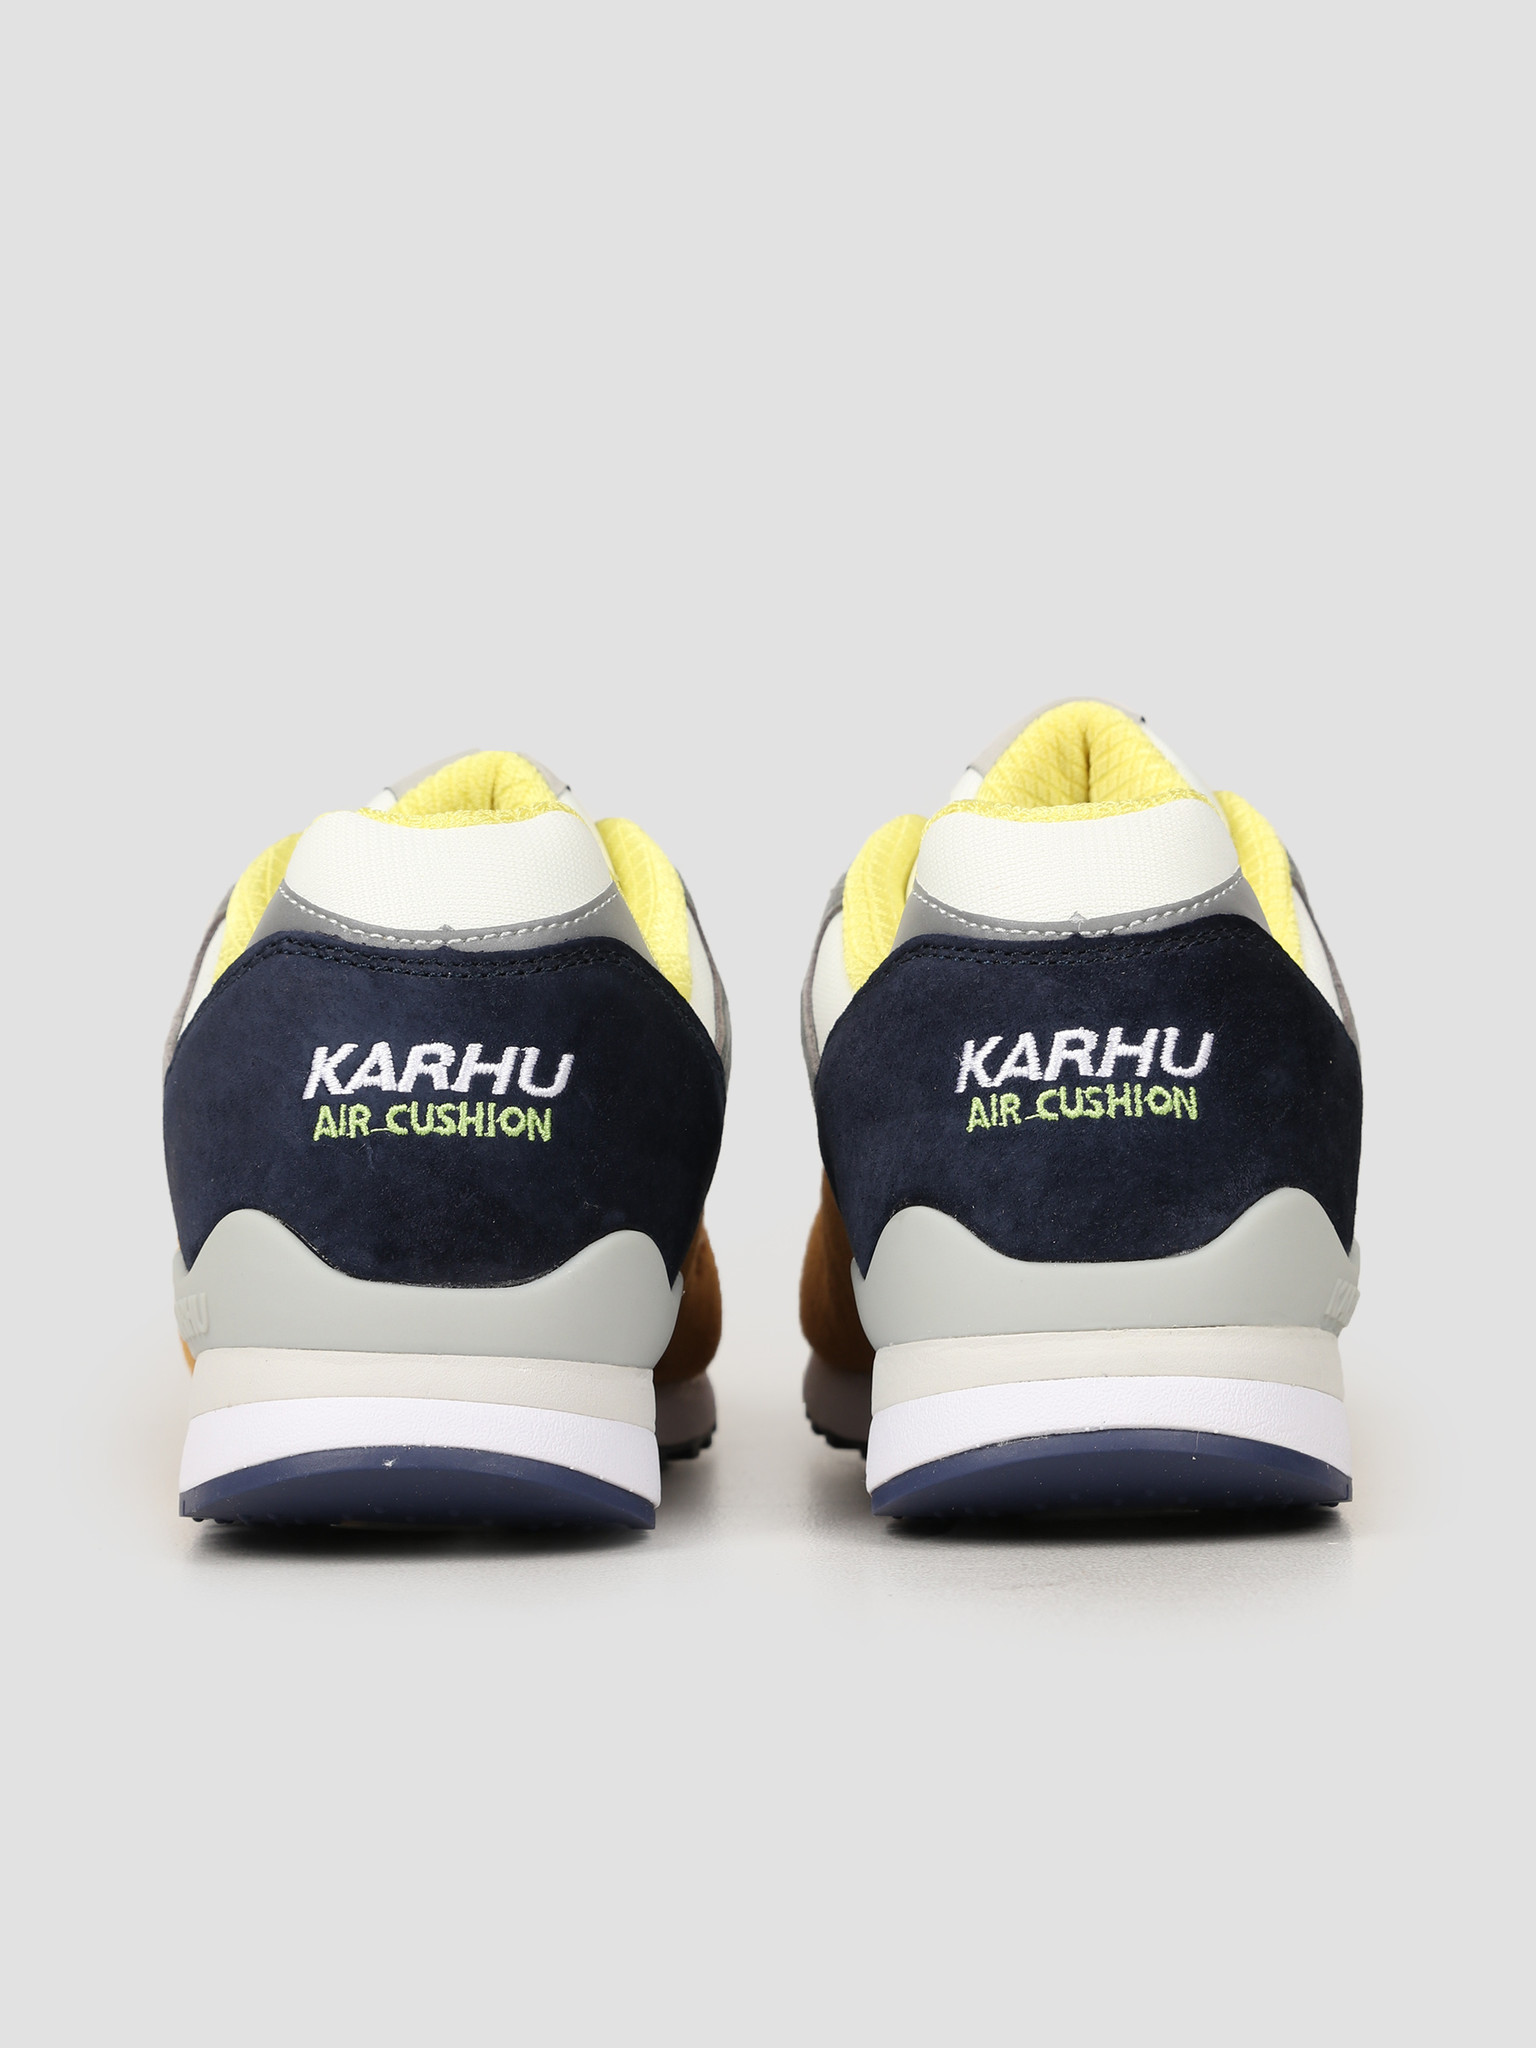 Karhu Karhu Synchron Classic Buckthorn Brown Ocean Depths F802639